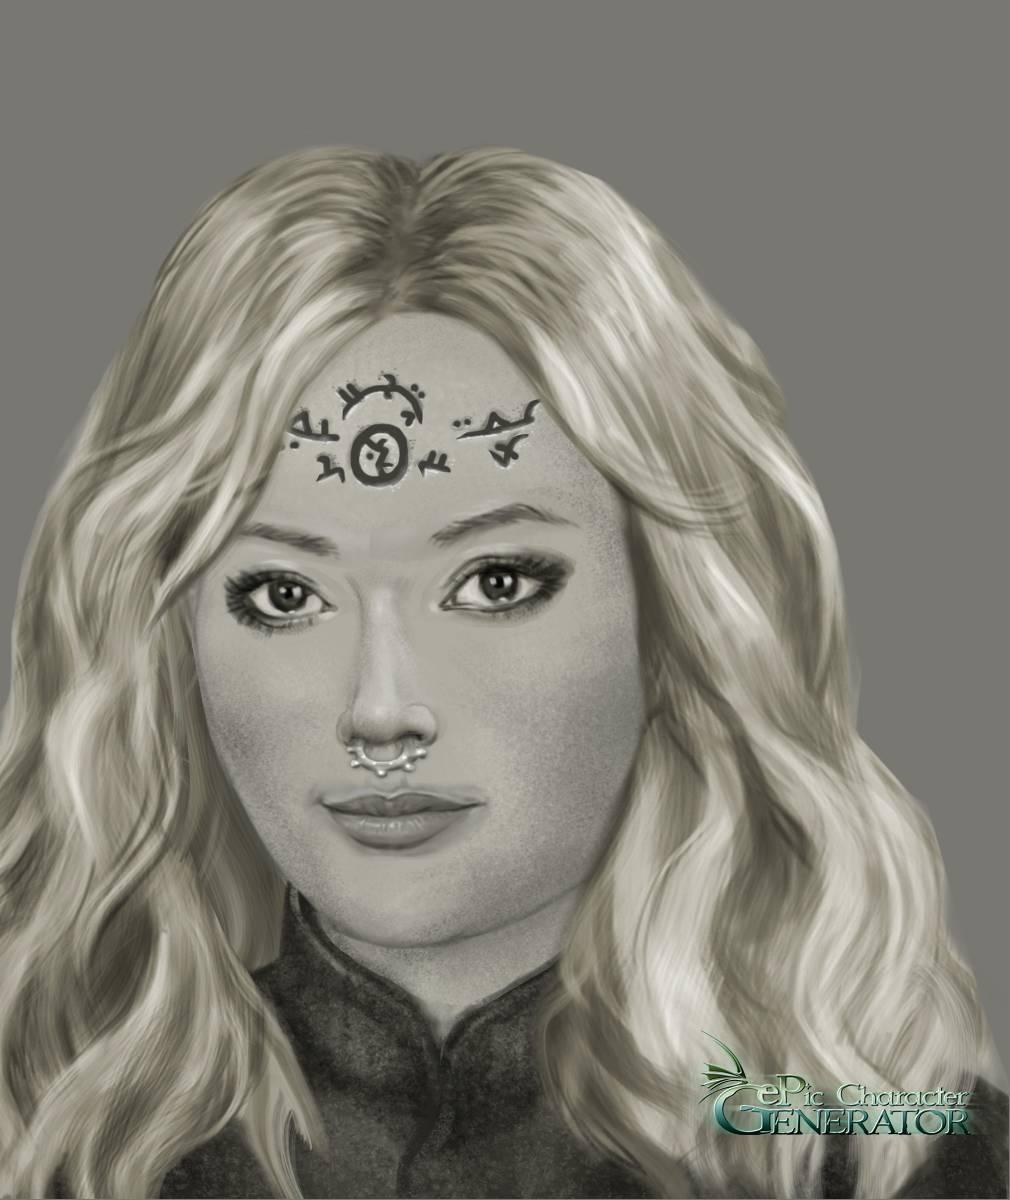 ePic Character Generator Season 3 Female Portrait Screenshot 09